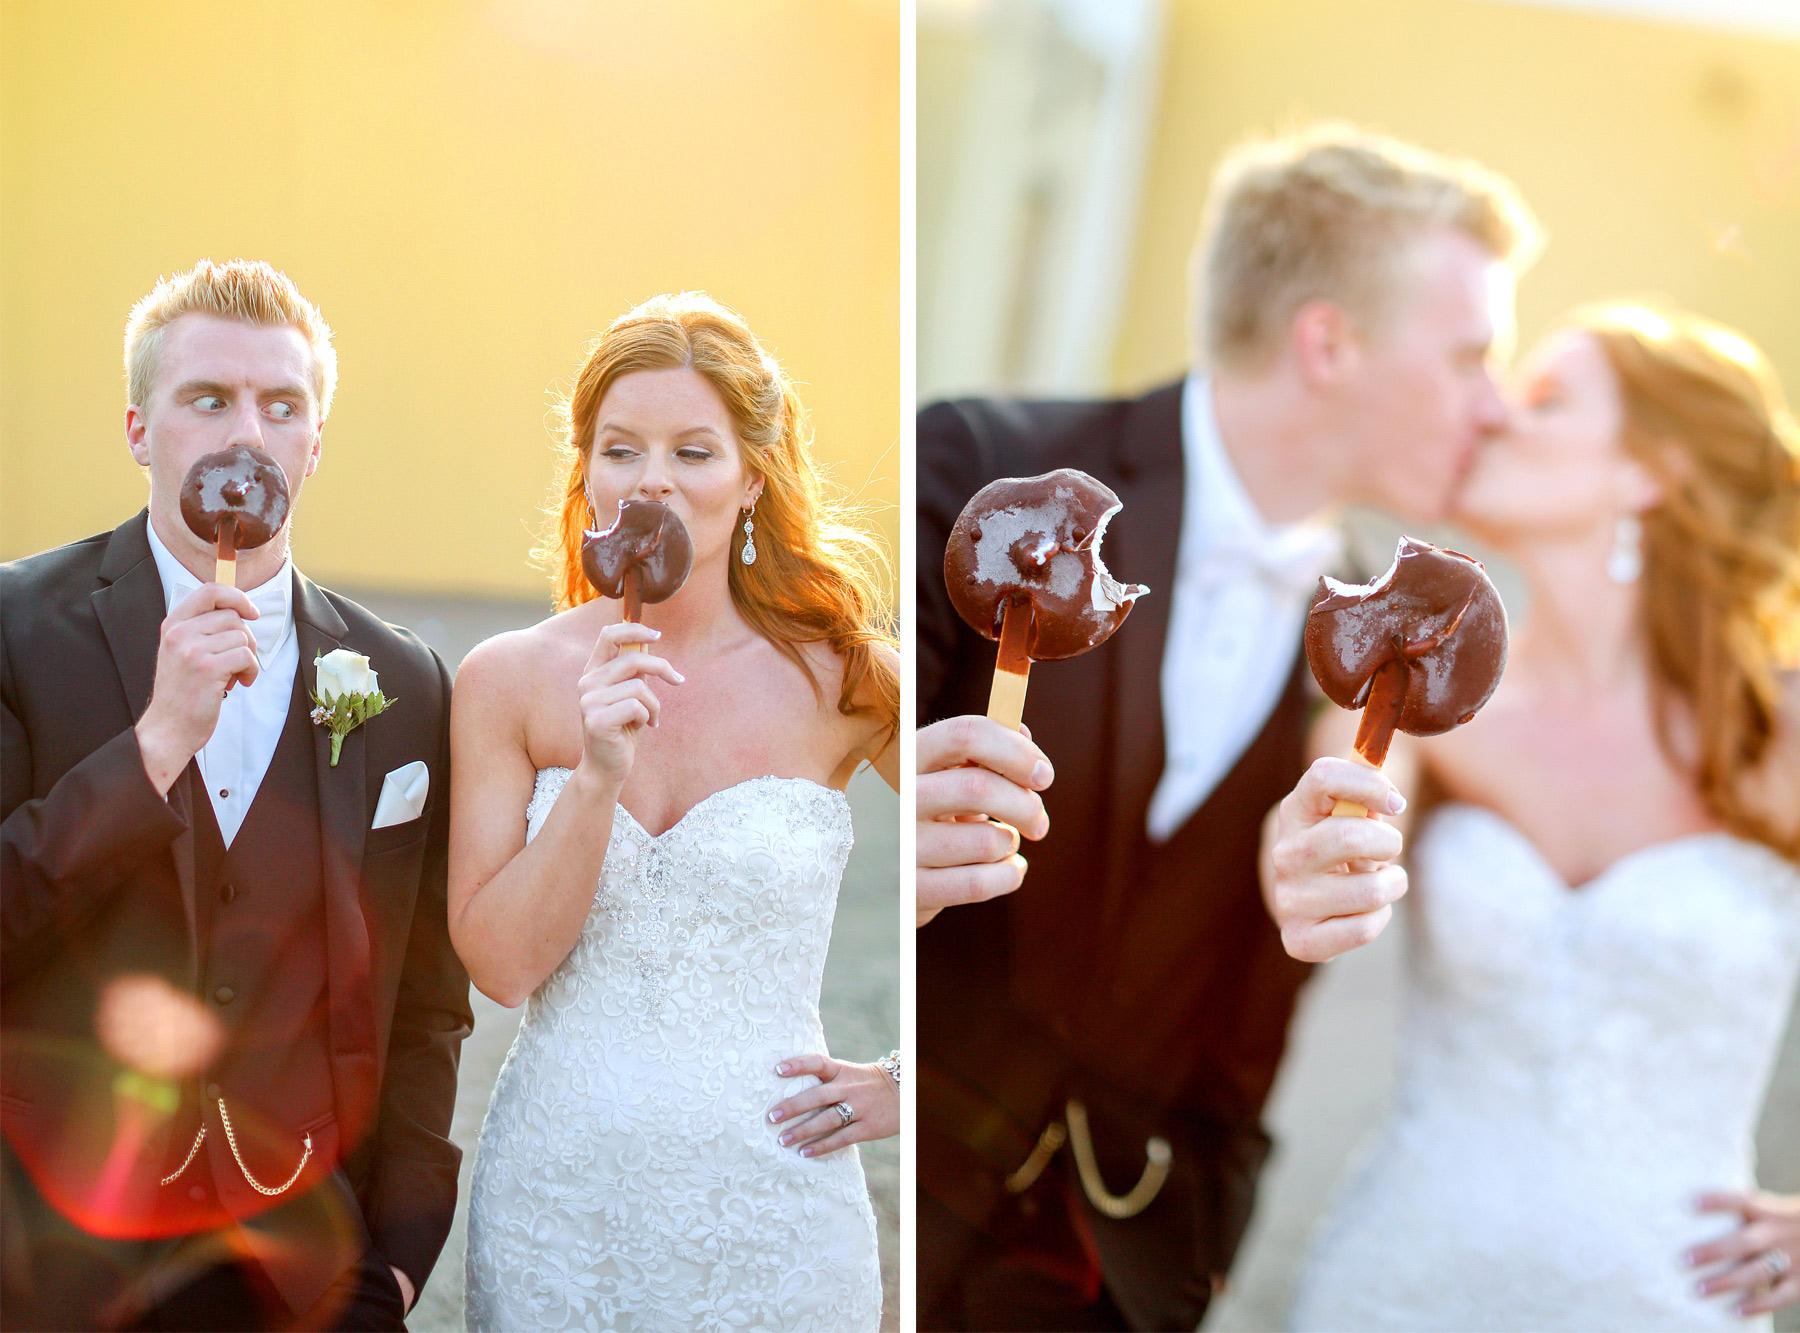 11-Minneapolis-Minnesota-Wedding-Photography-by-Vick-Photography-Dairy-Queen-Wedding-Dilly-Bar-Tianna-&-Matt.jpg